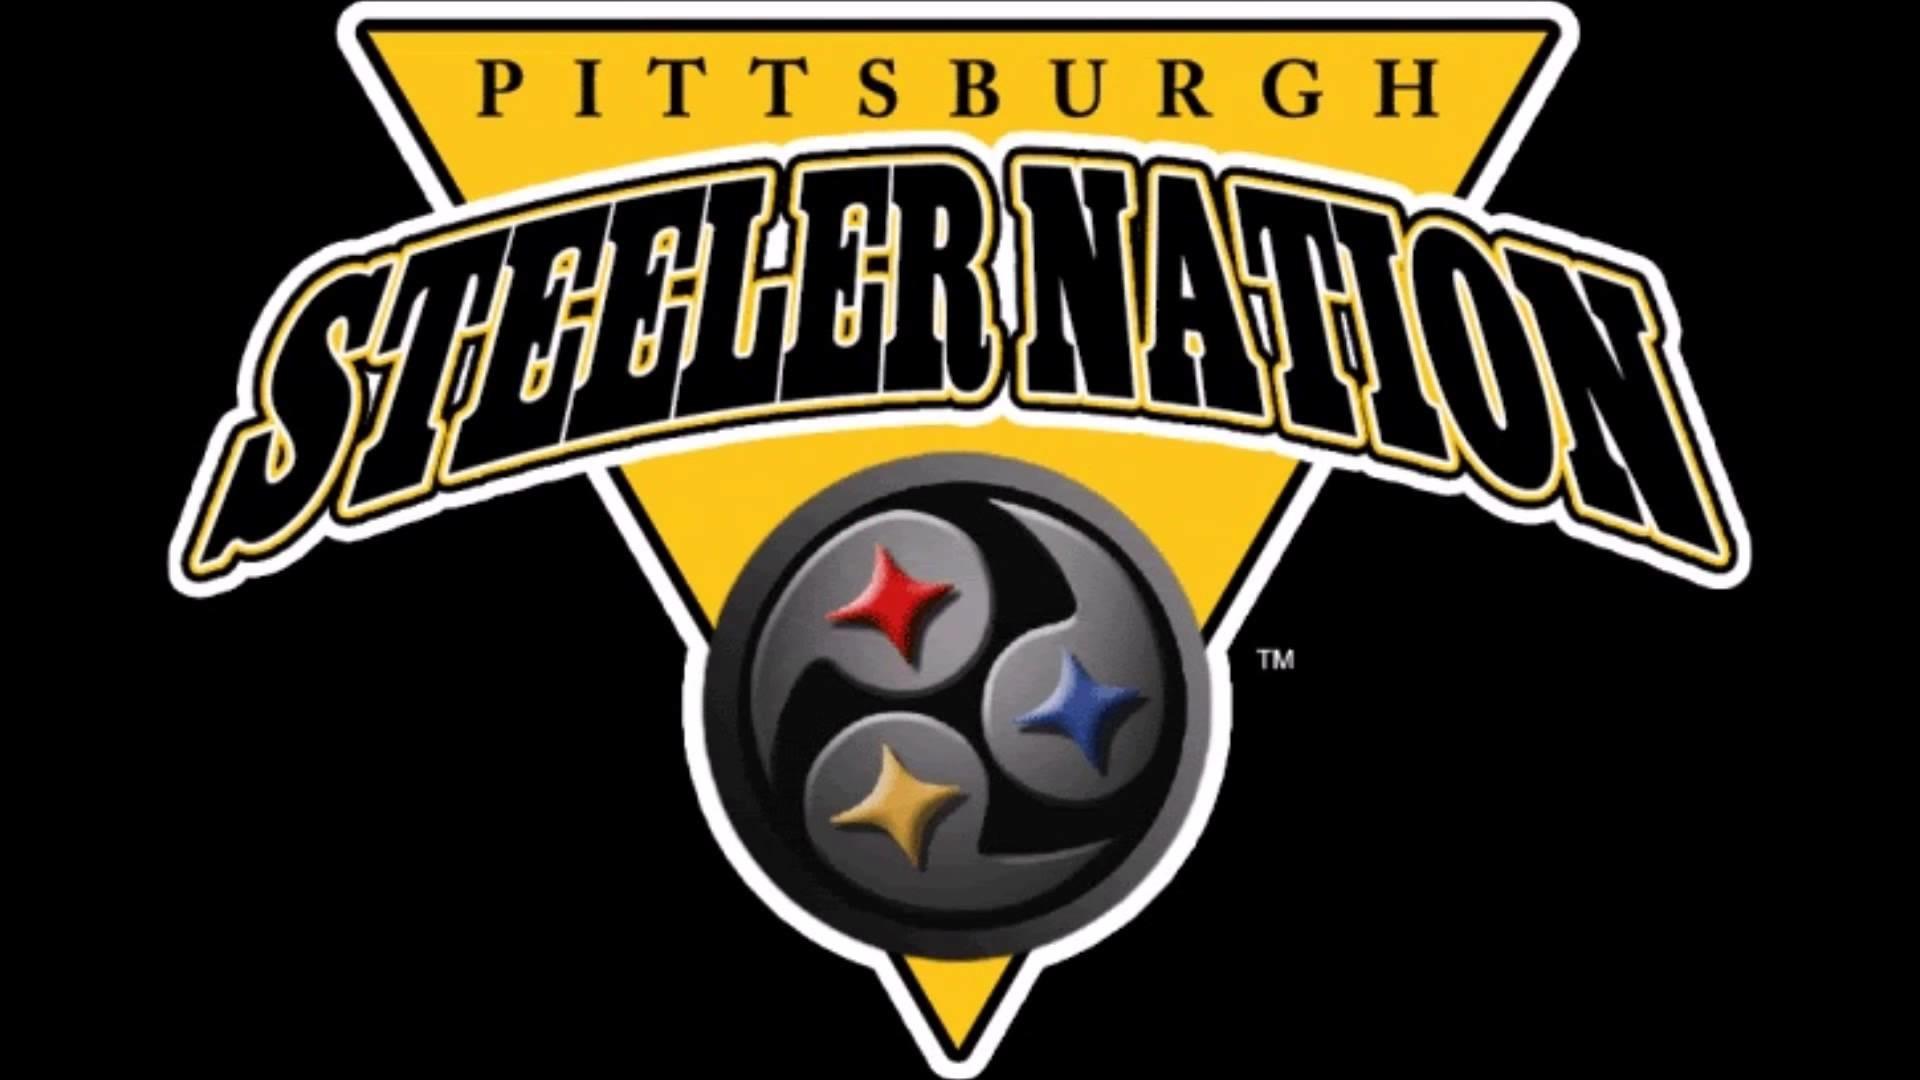 Pittsburgh Steelers Iphone Wallpaper Pittsburgh Steelers Live Wallpaper 70 Images